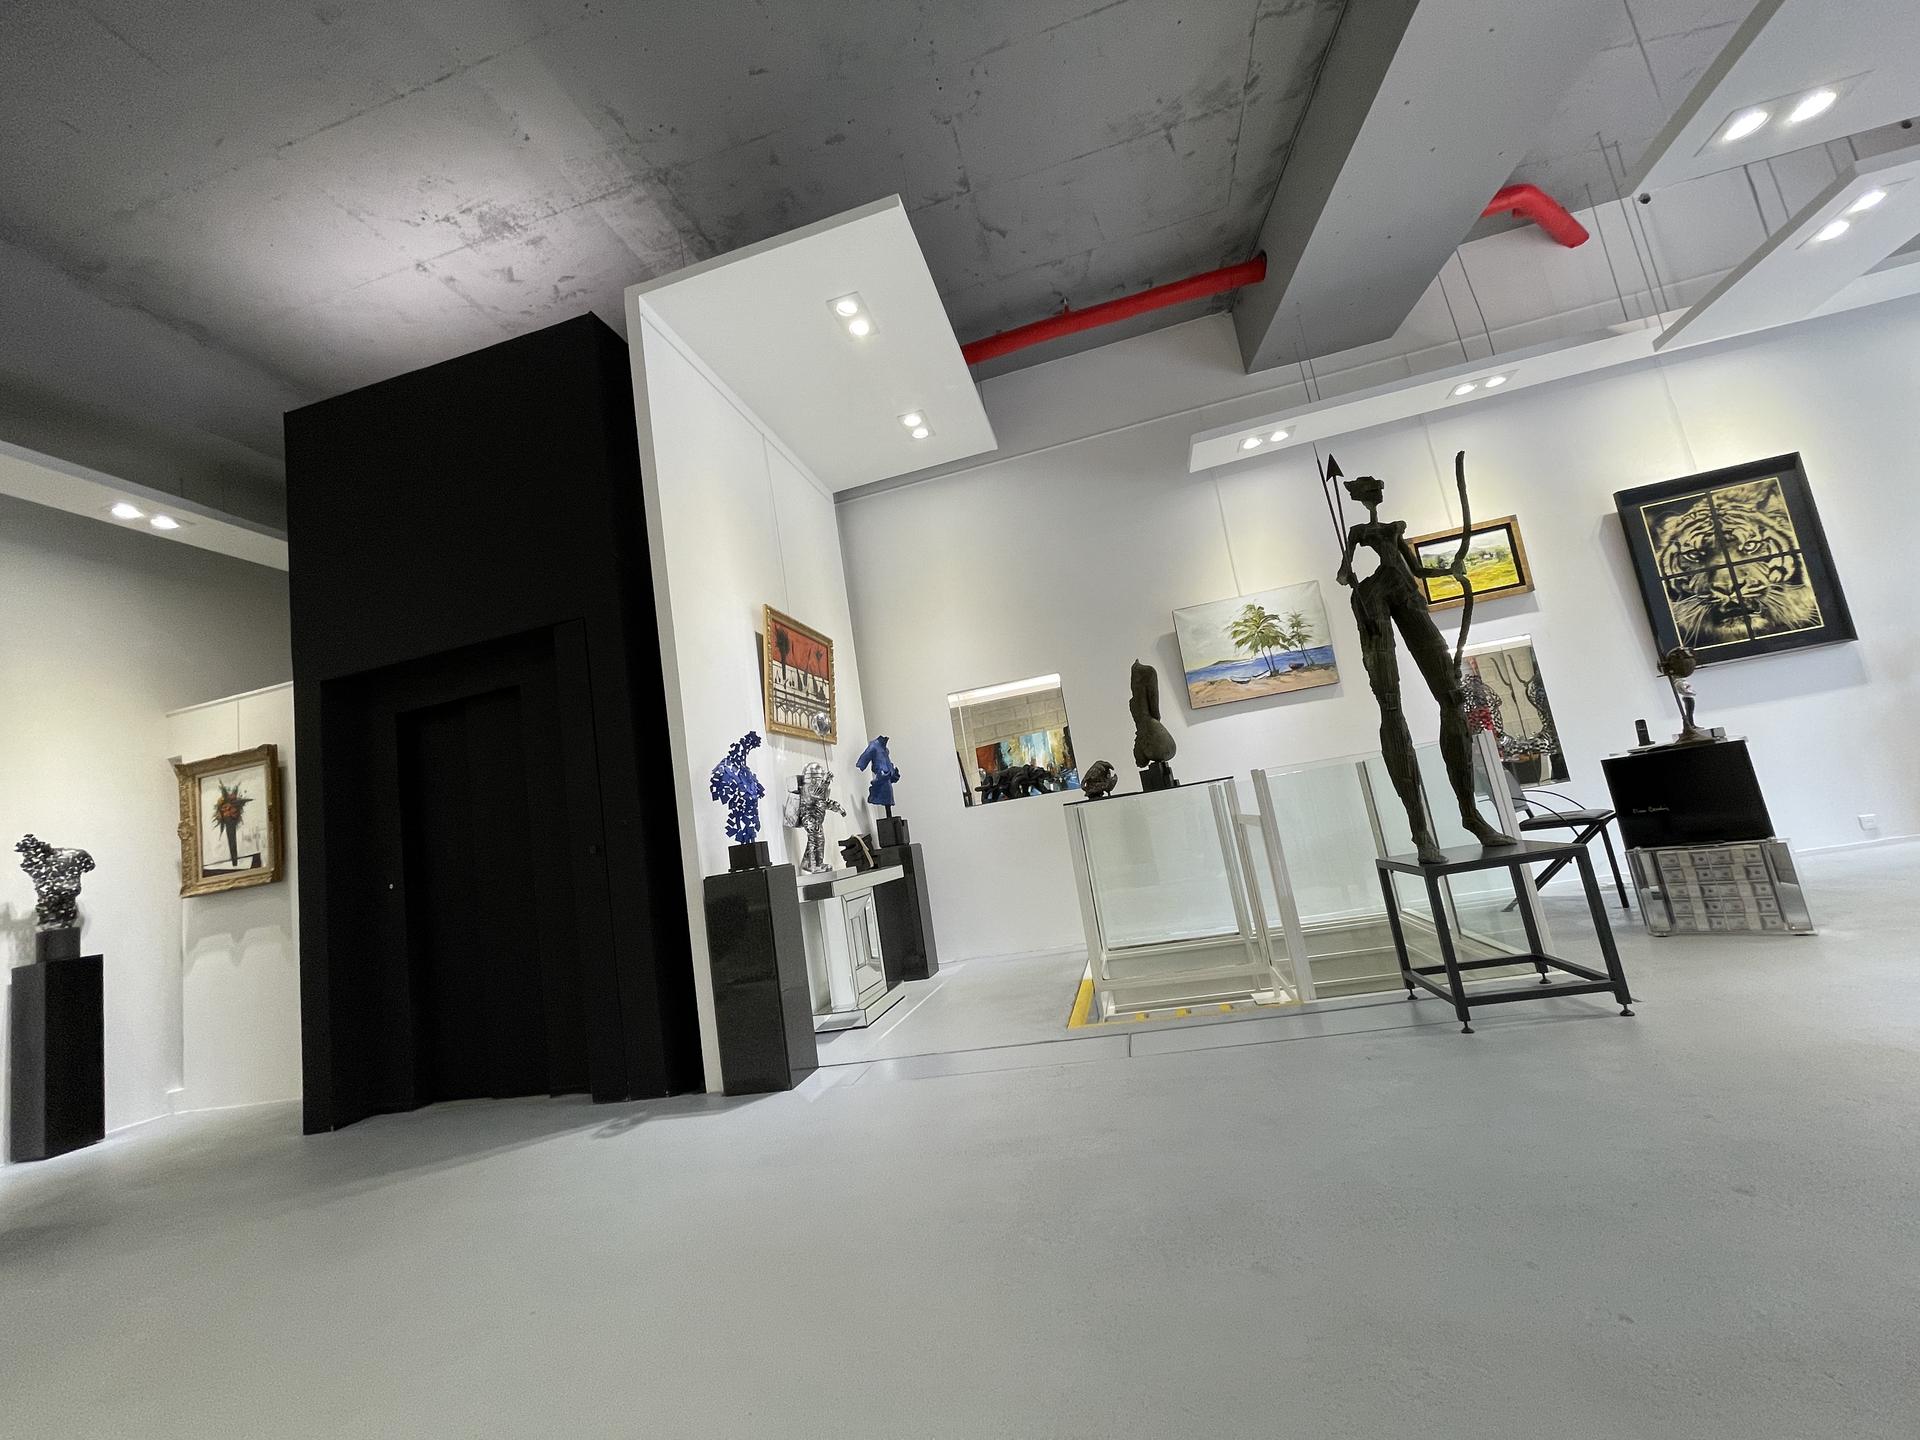 Galerie Leadouze 16 Matignon  3.HEIC